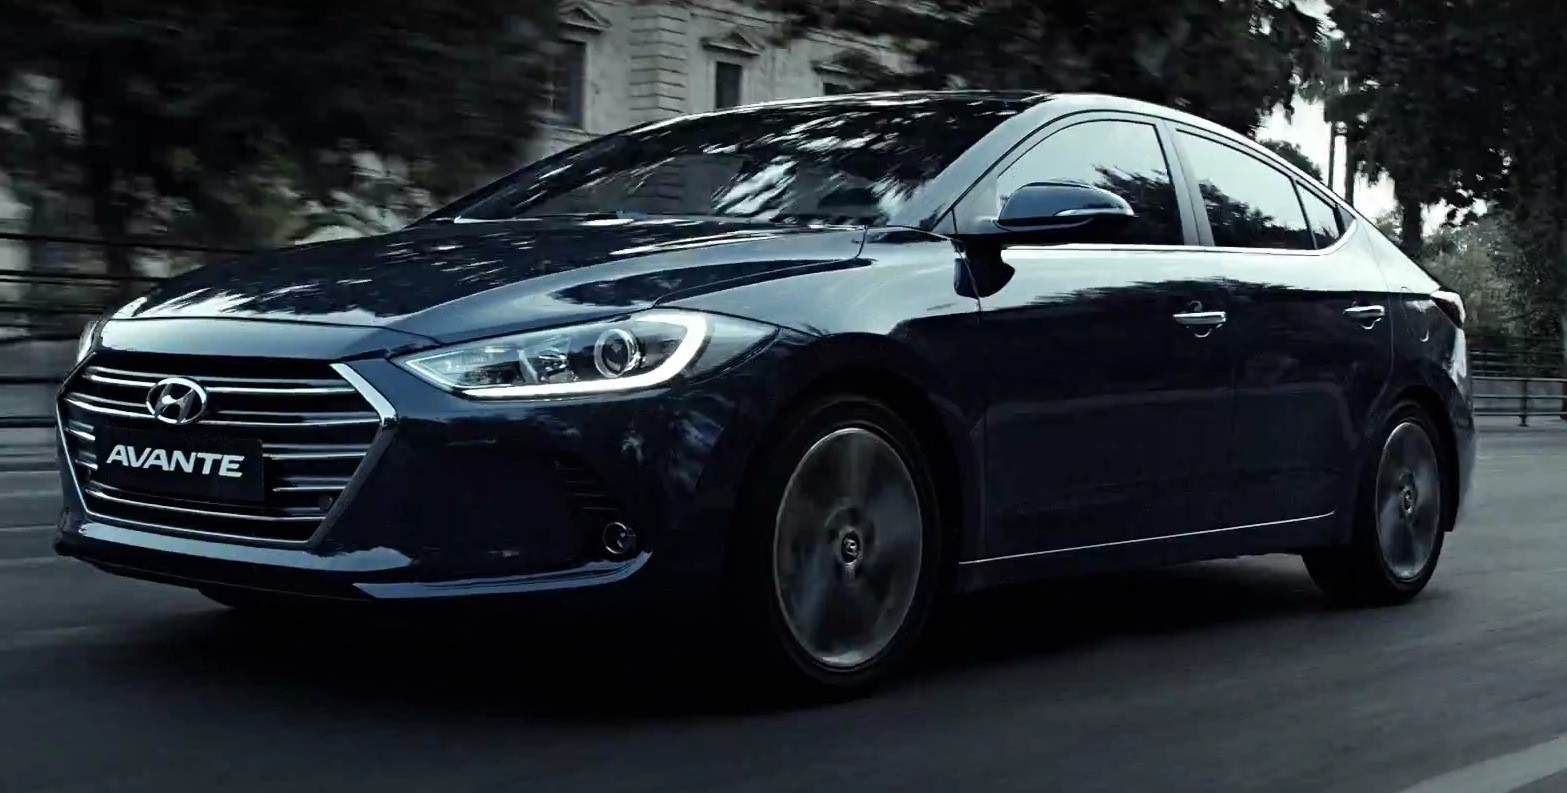 2016 2017 Hyundai Elantra Sedan Revealed In Korea With 1